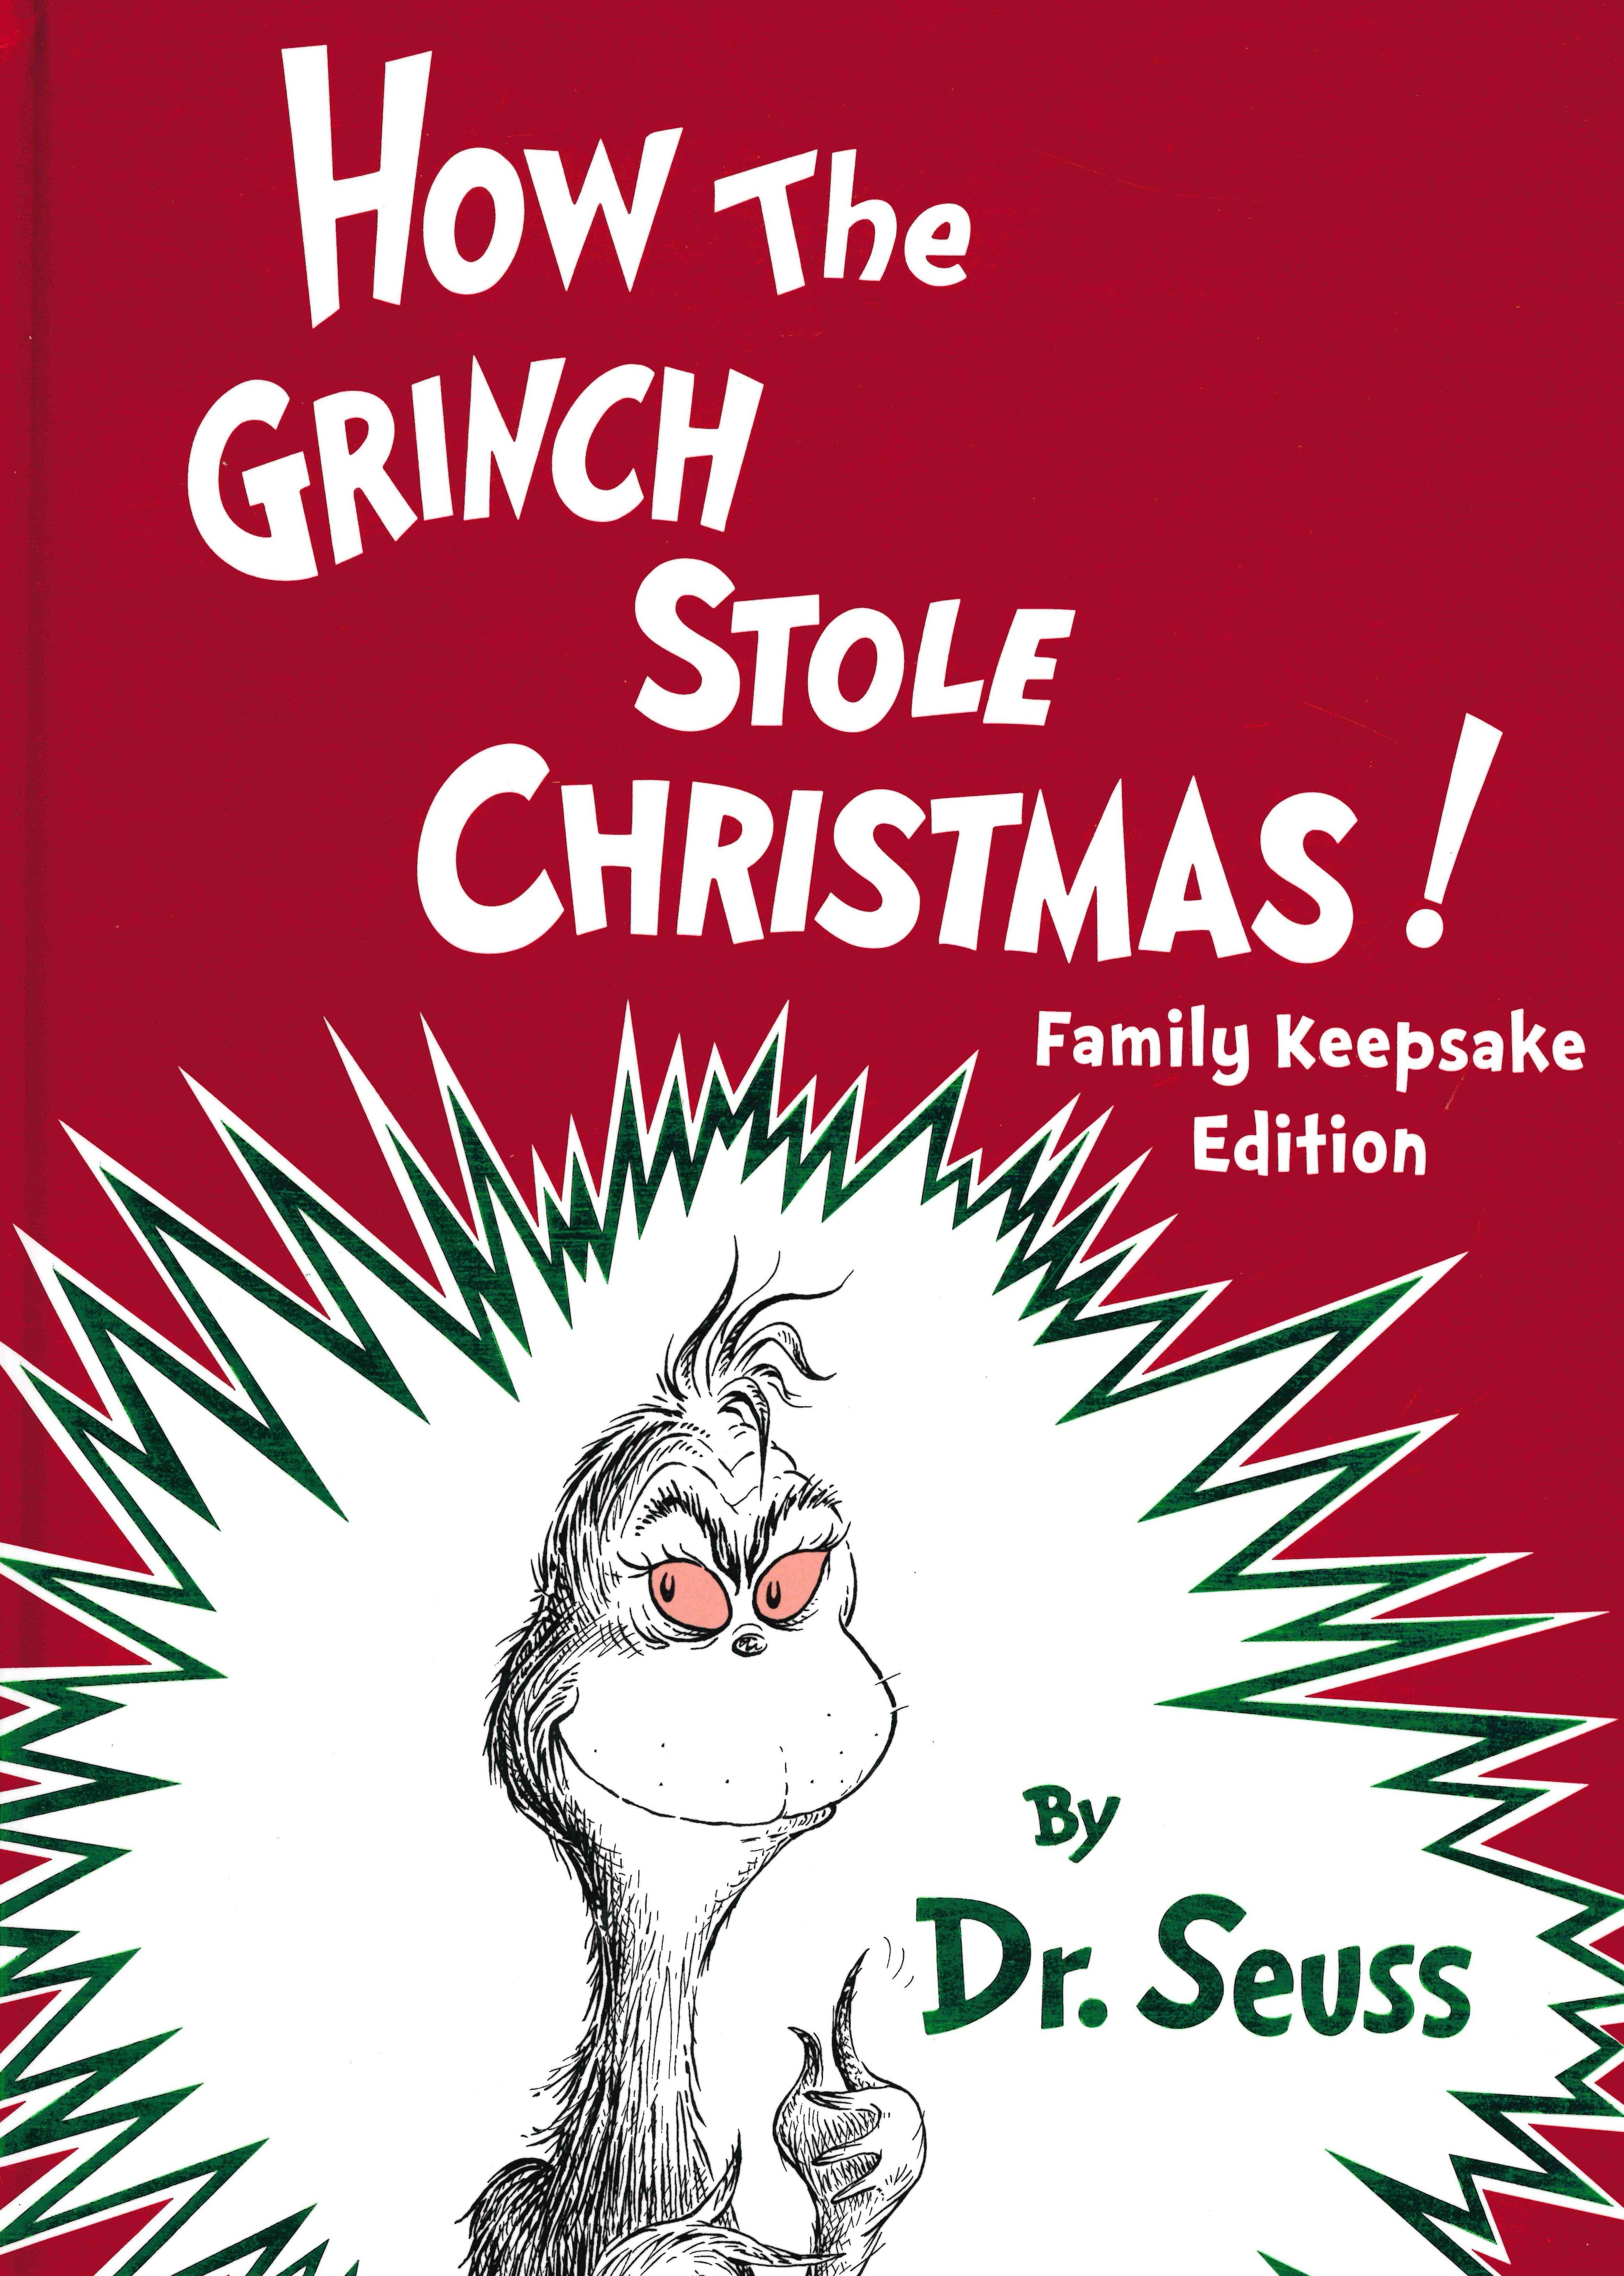 Illumination How The Grinch Stole Christmas 2020 HOW THE GRINCH STOLE CHRISTMAS! FAMILY KEEPSAKE EDITION (HARDCOVER